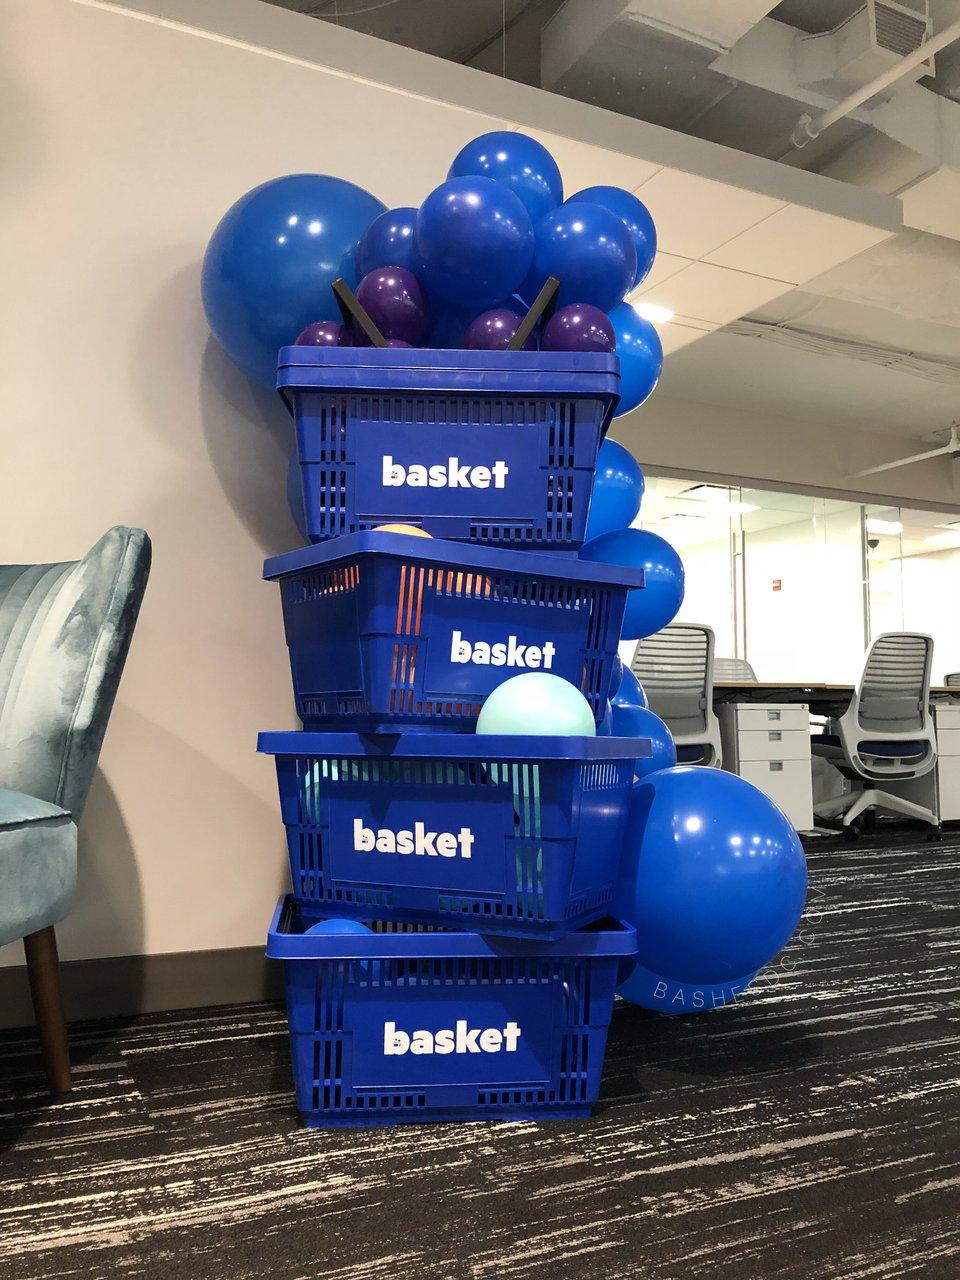 Basket App - HQ Opening Celebration  photo B6EA3CCF-2D33-46DC-9D22-7D6046373565.jpg